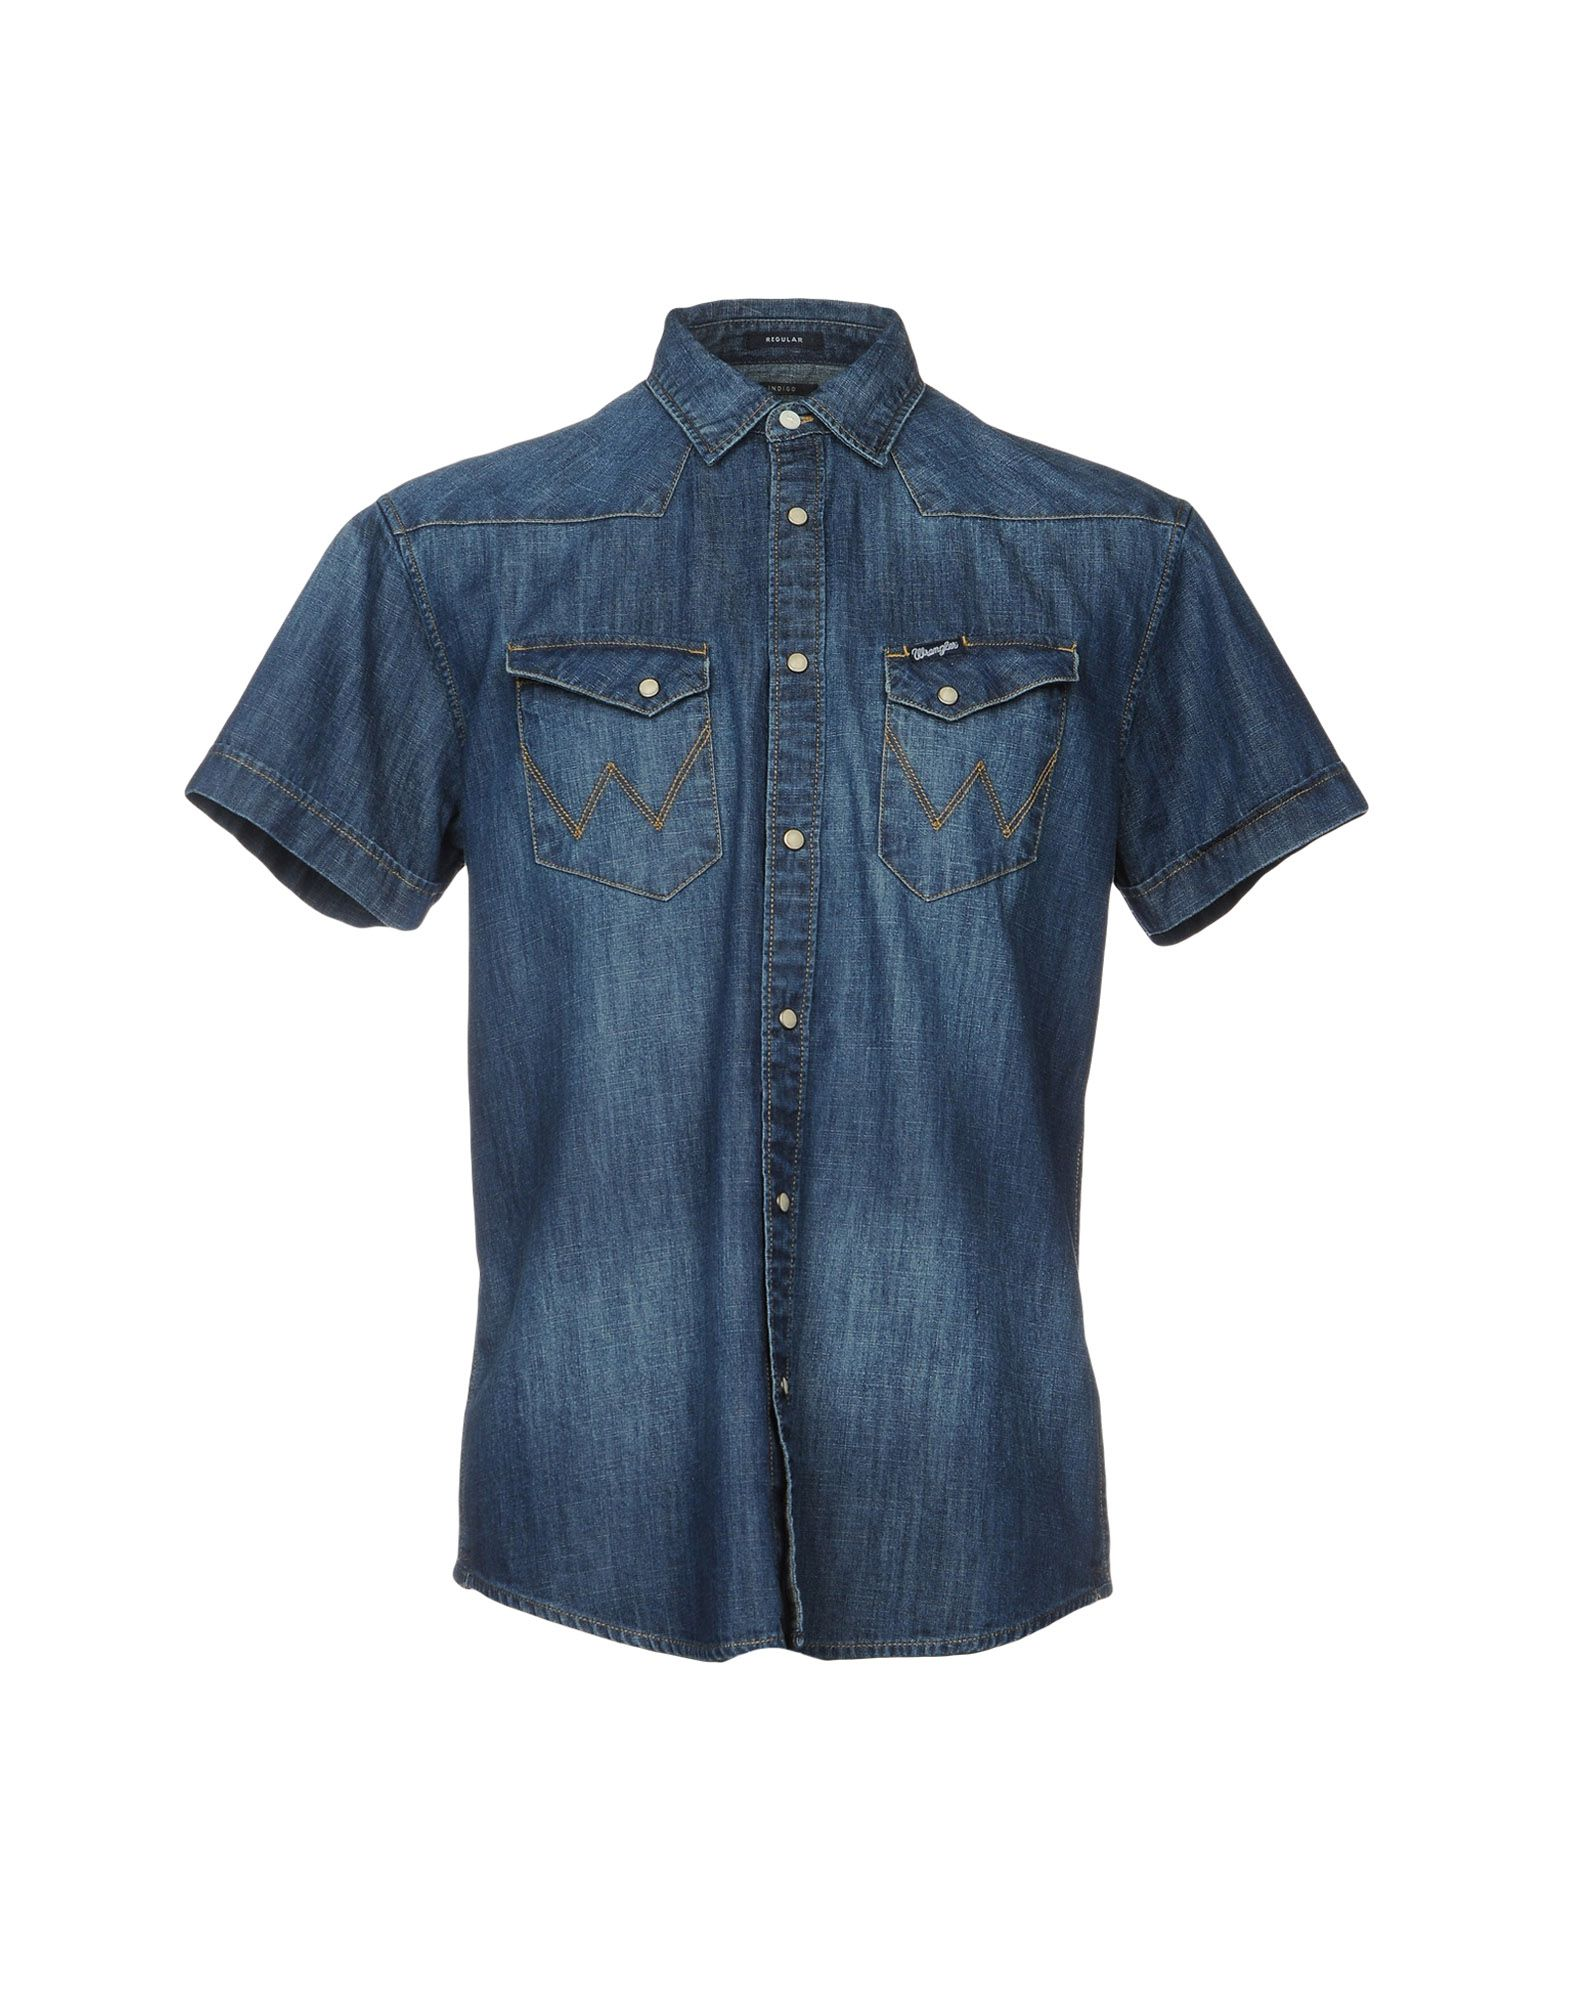 WRANGLER Джинсовая рубашка рубашка джинсовая wrangler wrangler wr224emvhf26